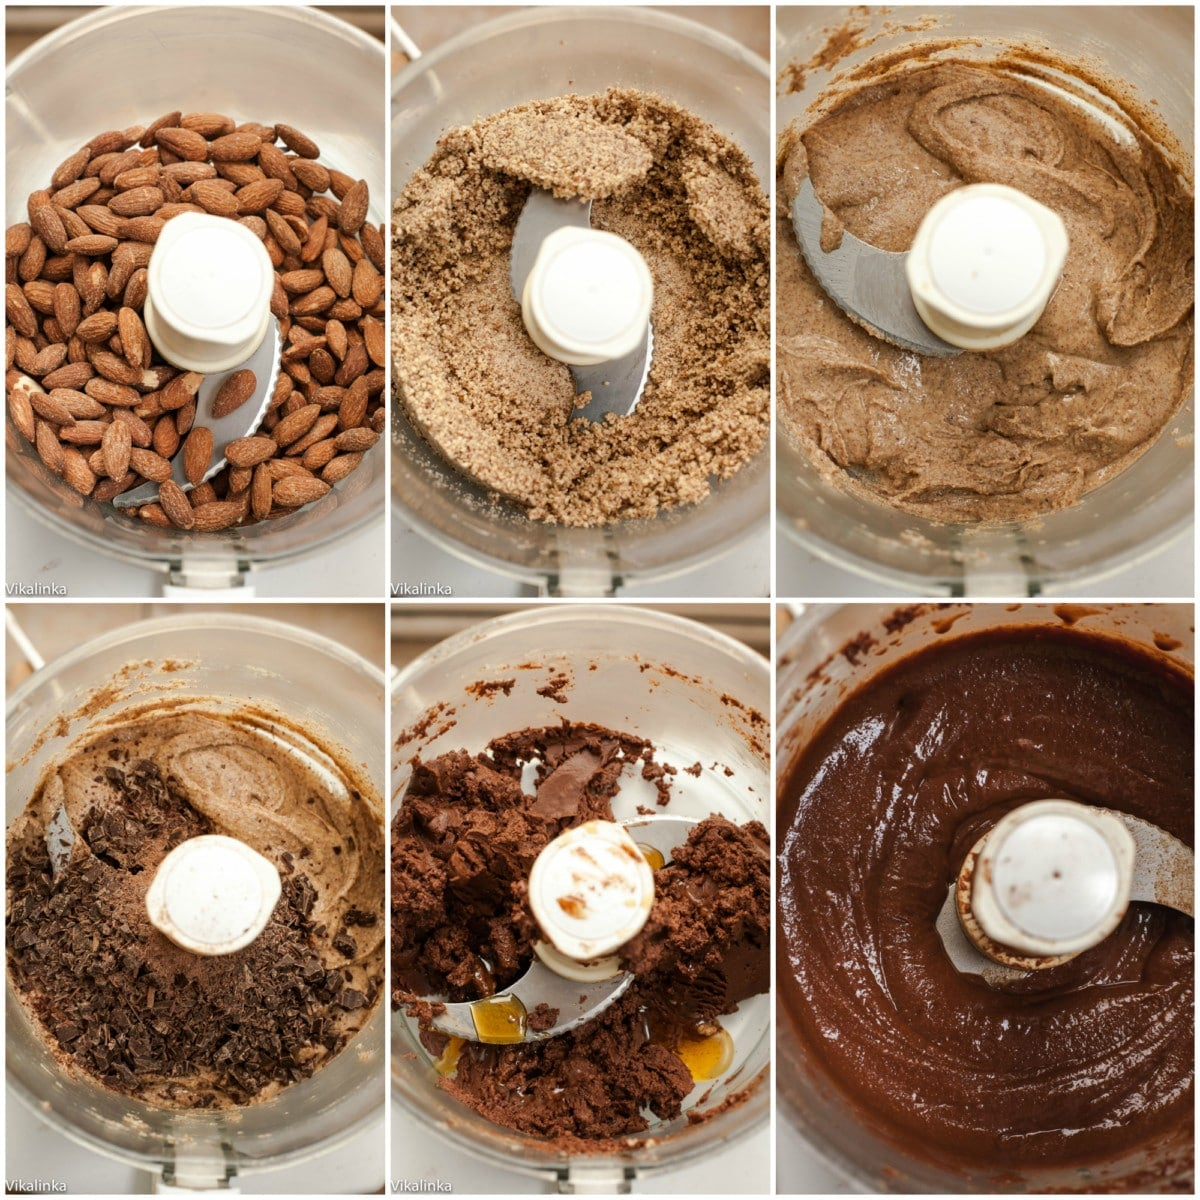 Process shots of nutella ingredients in blender